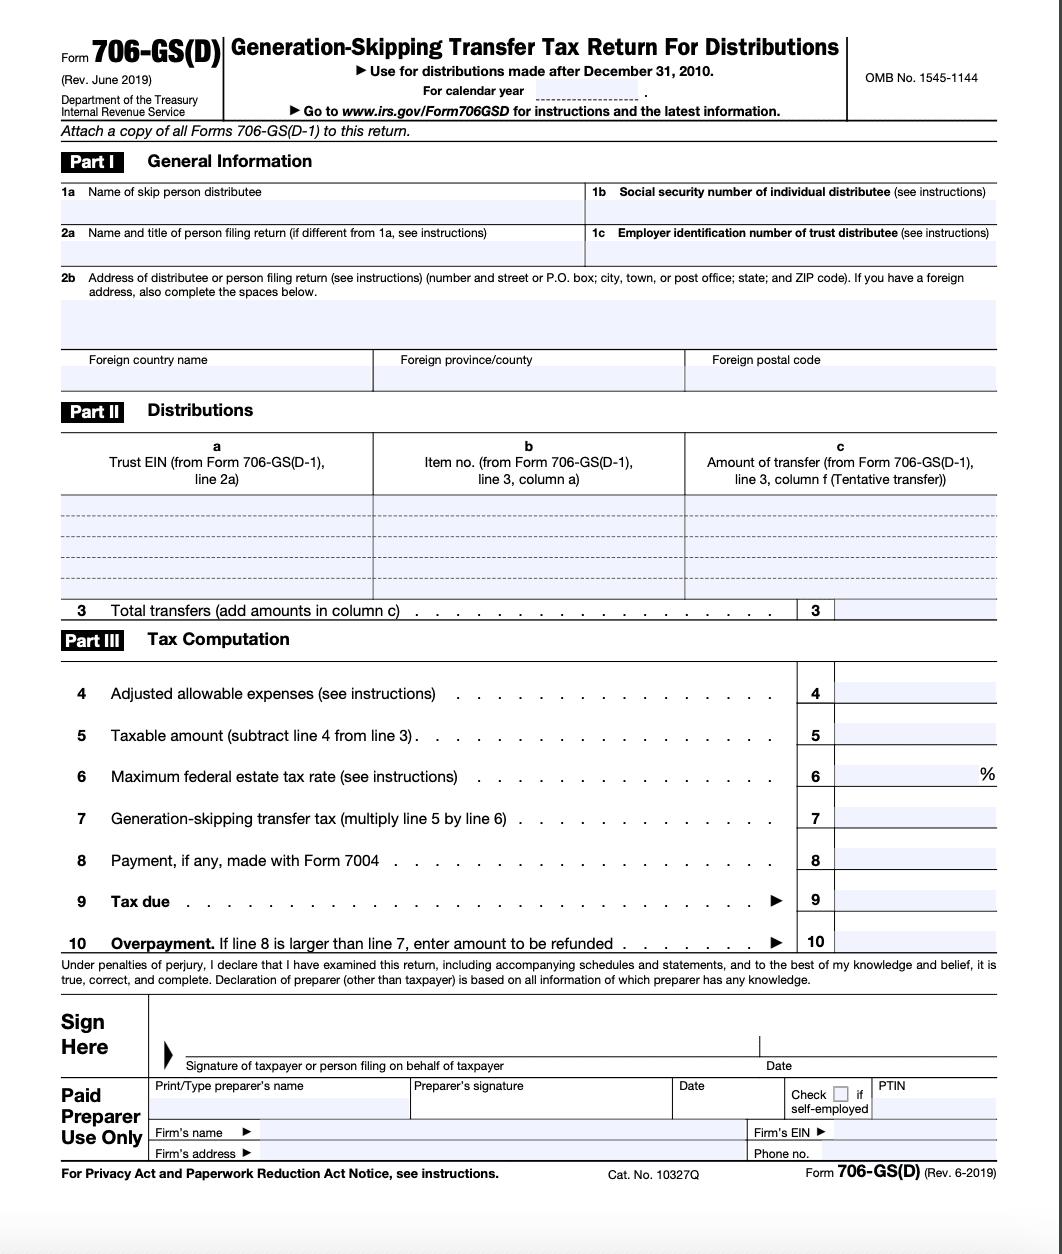 Form 706-GS(D) Page 1